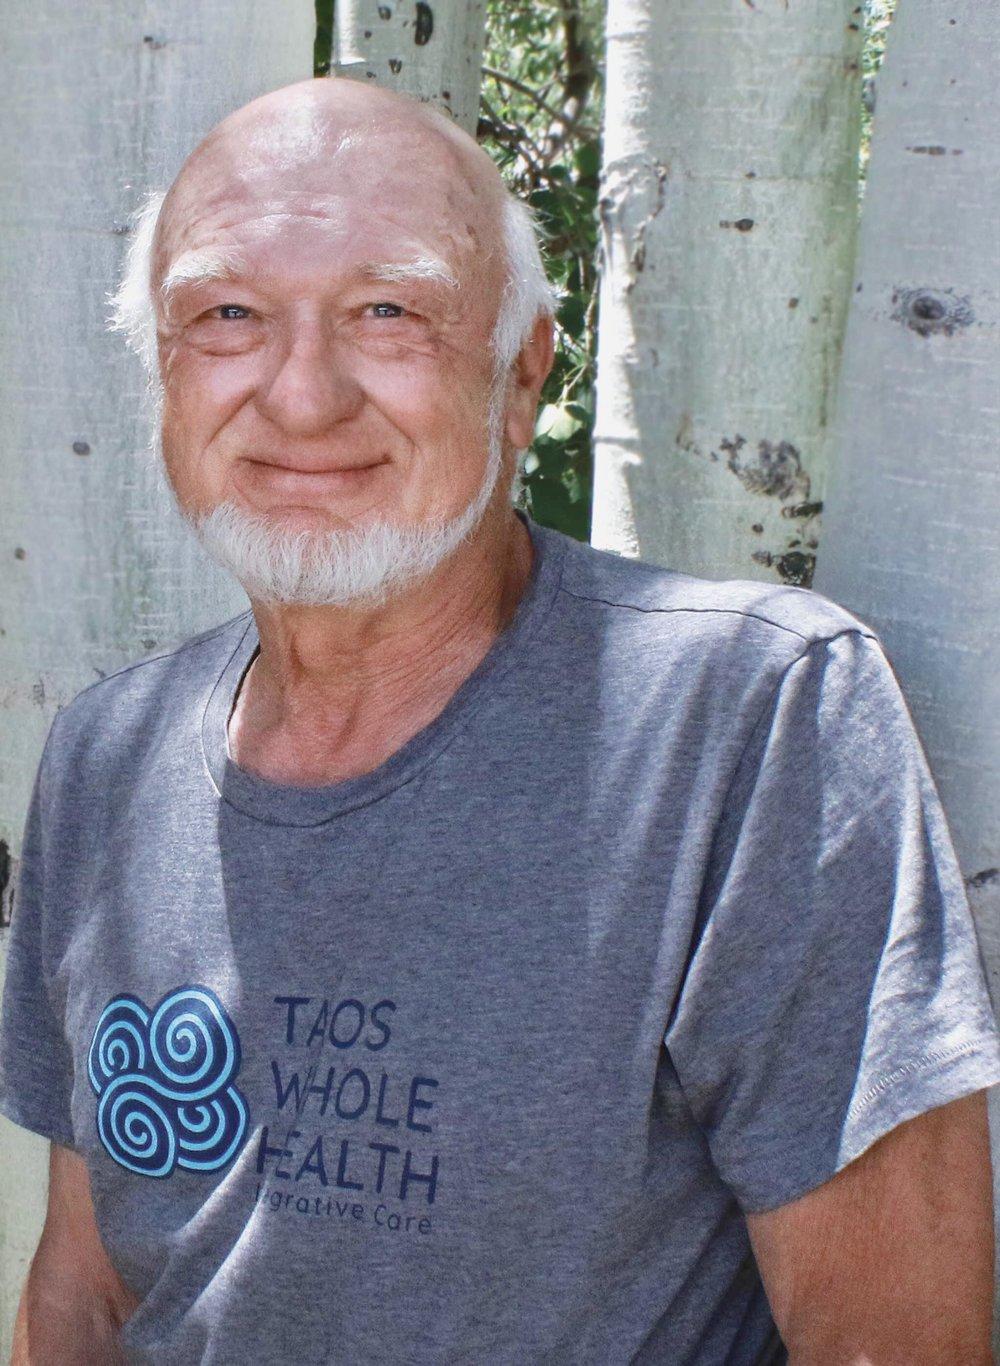 Carl Wagner - Taos Whole Health Integrative Care